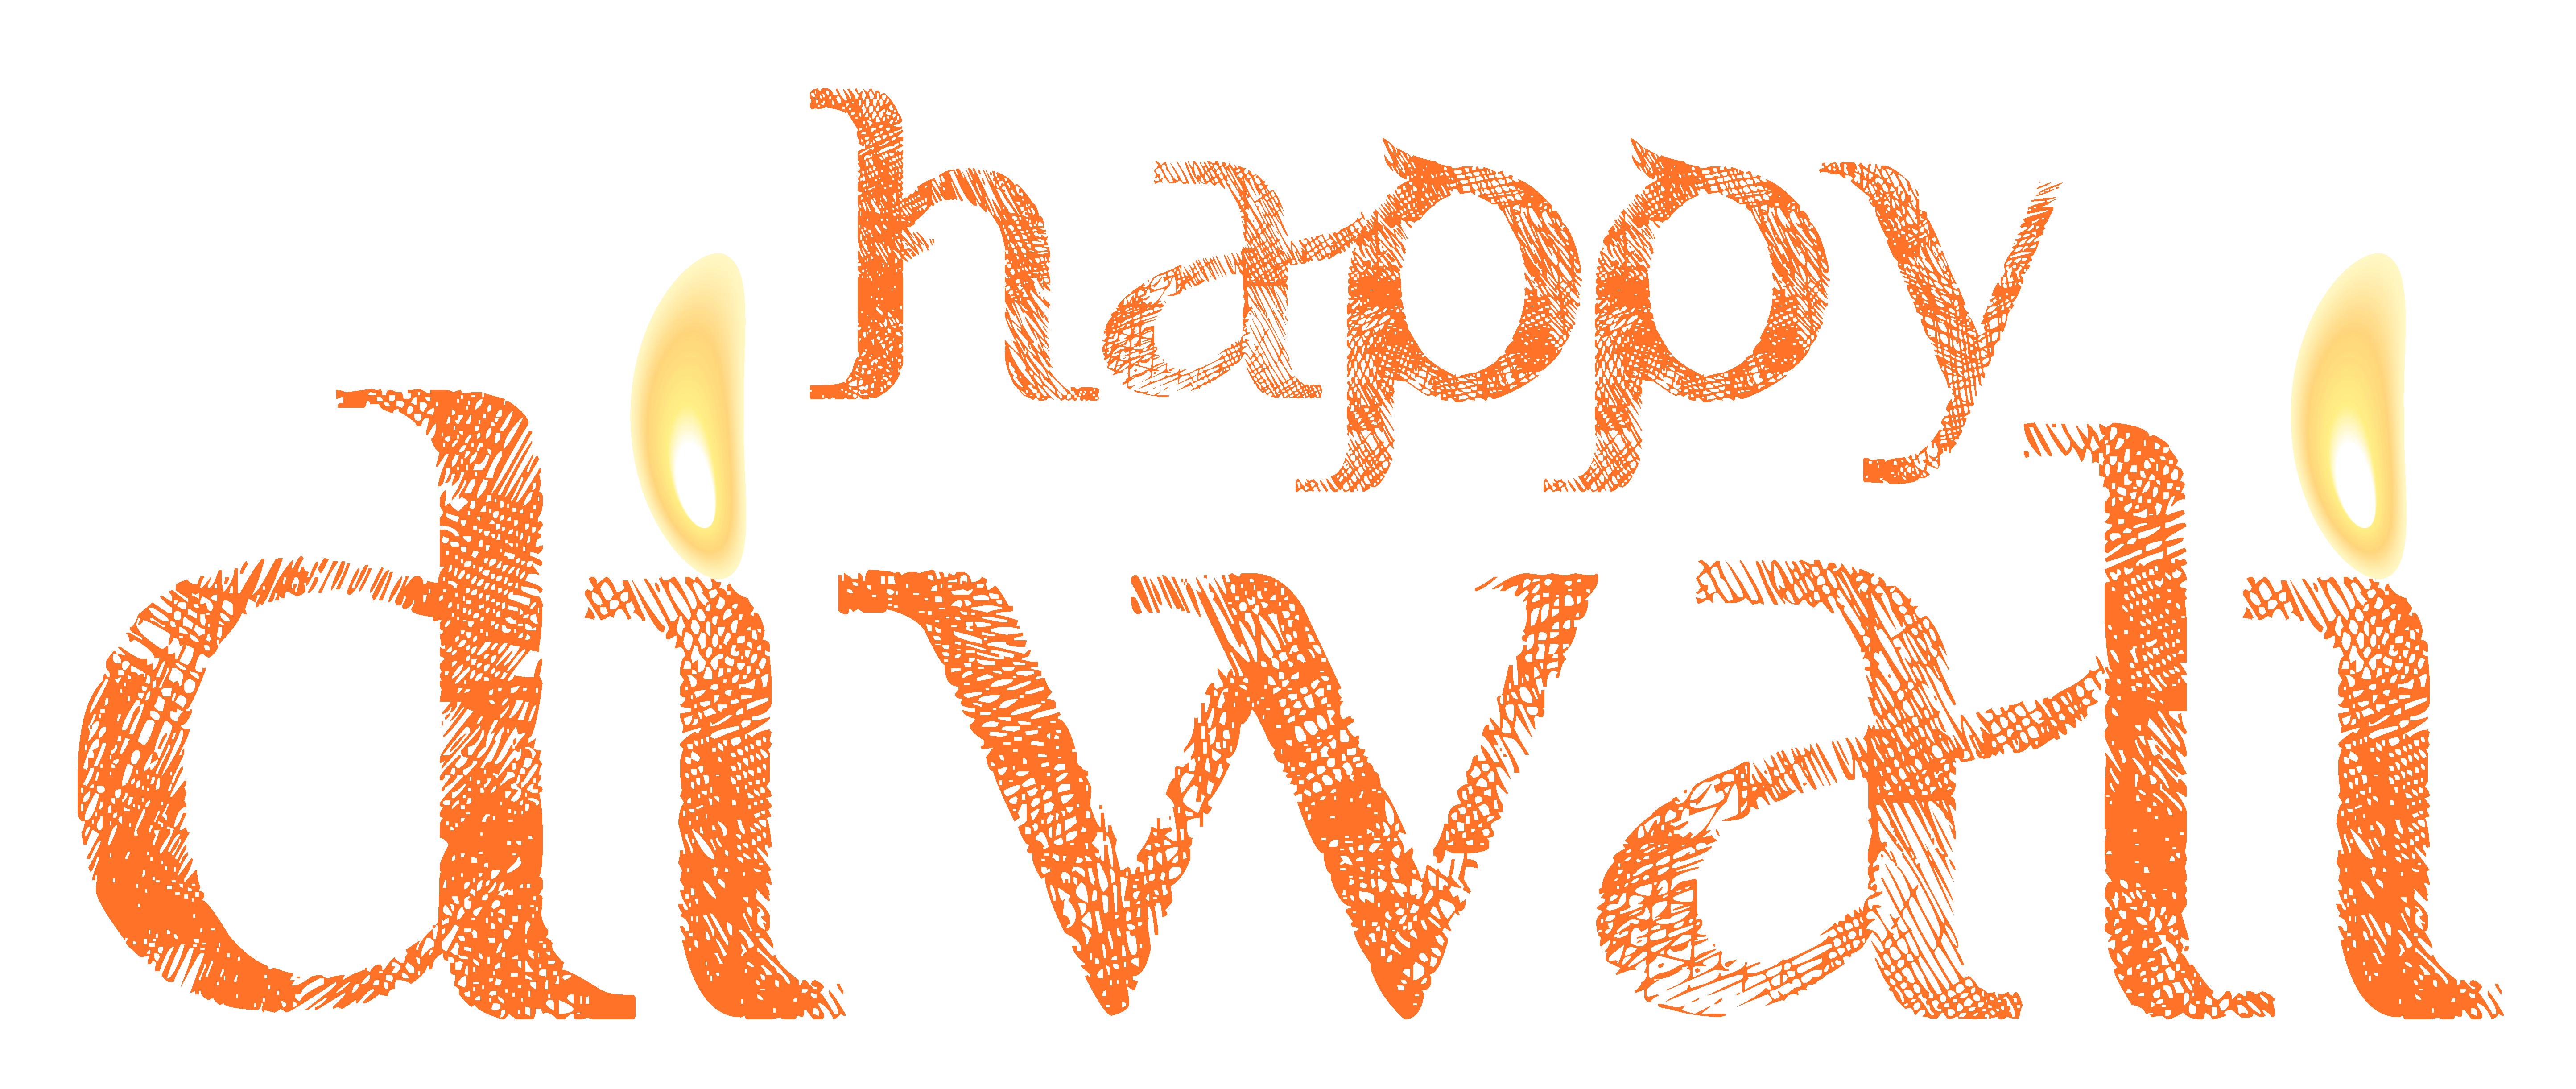 clipart freeuse download Deepavali top diwali png. Celebration clipart light.